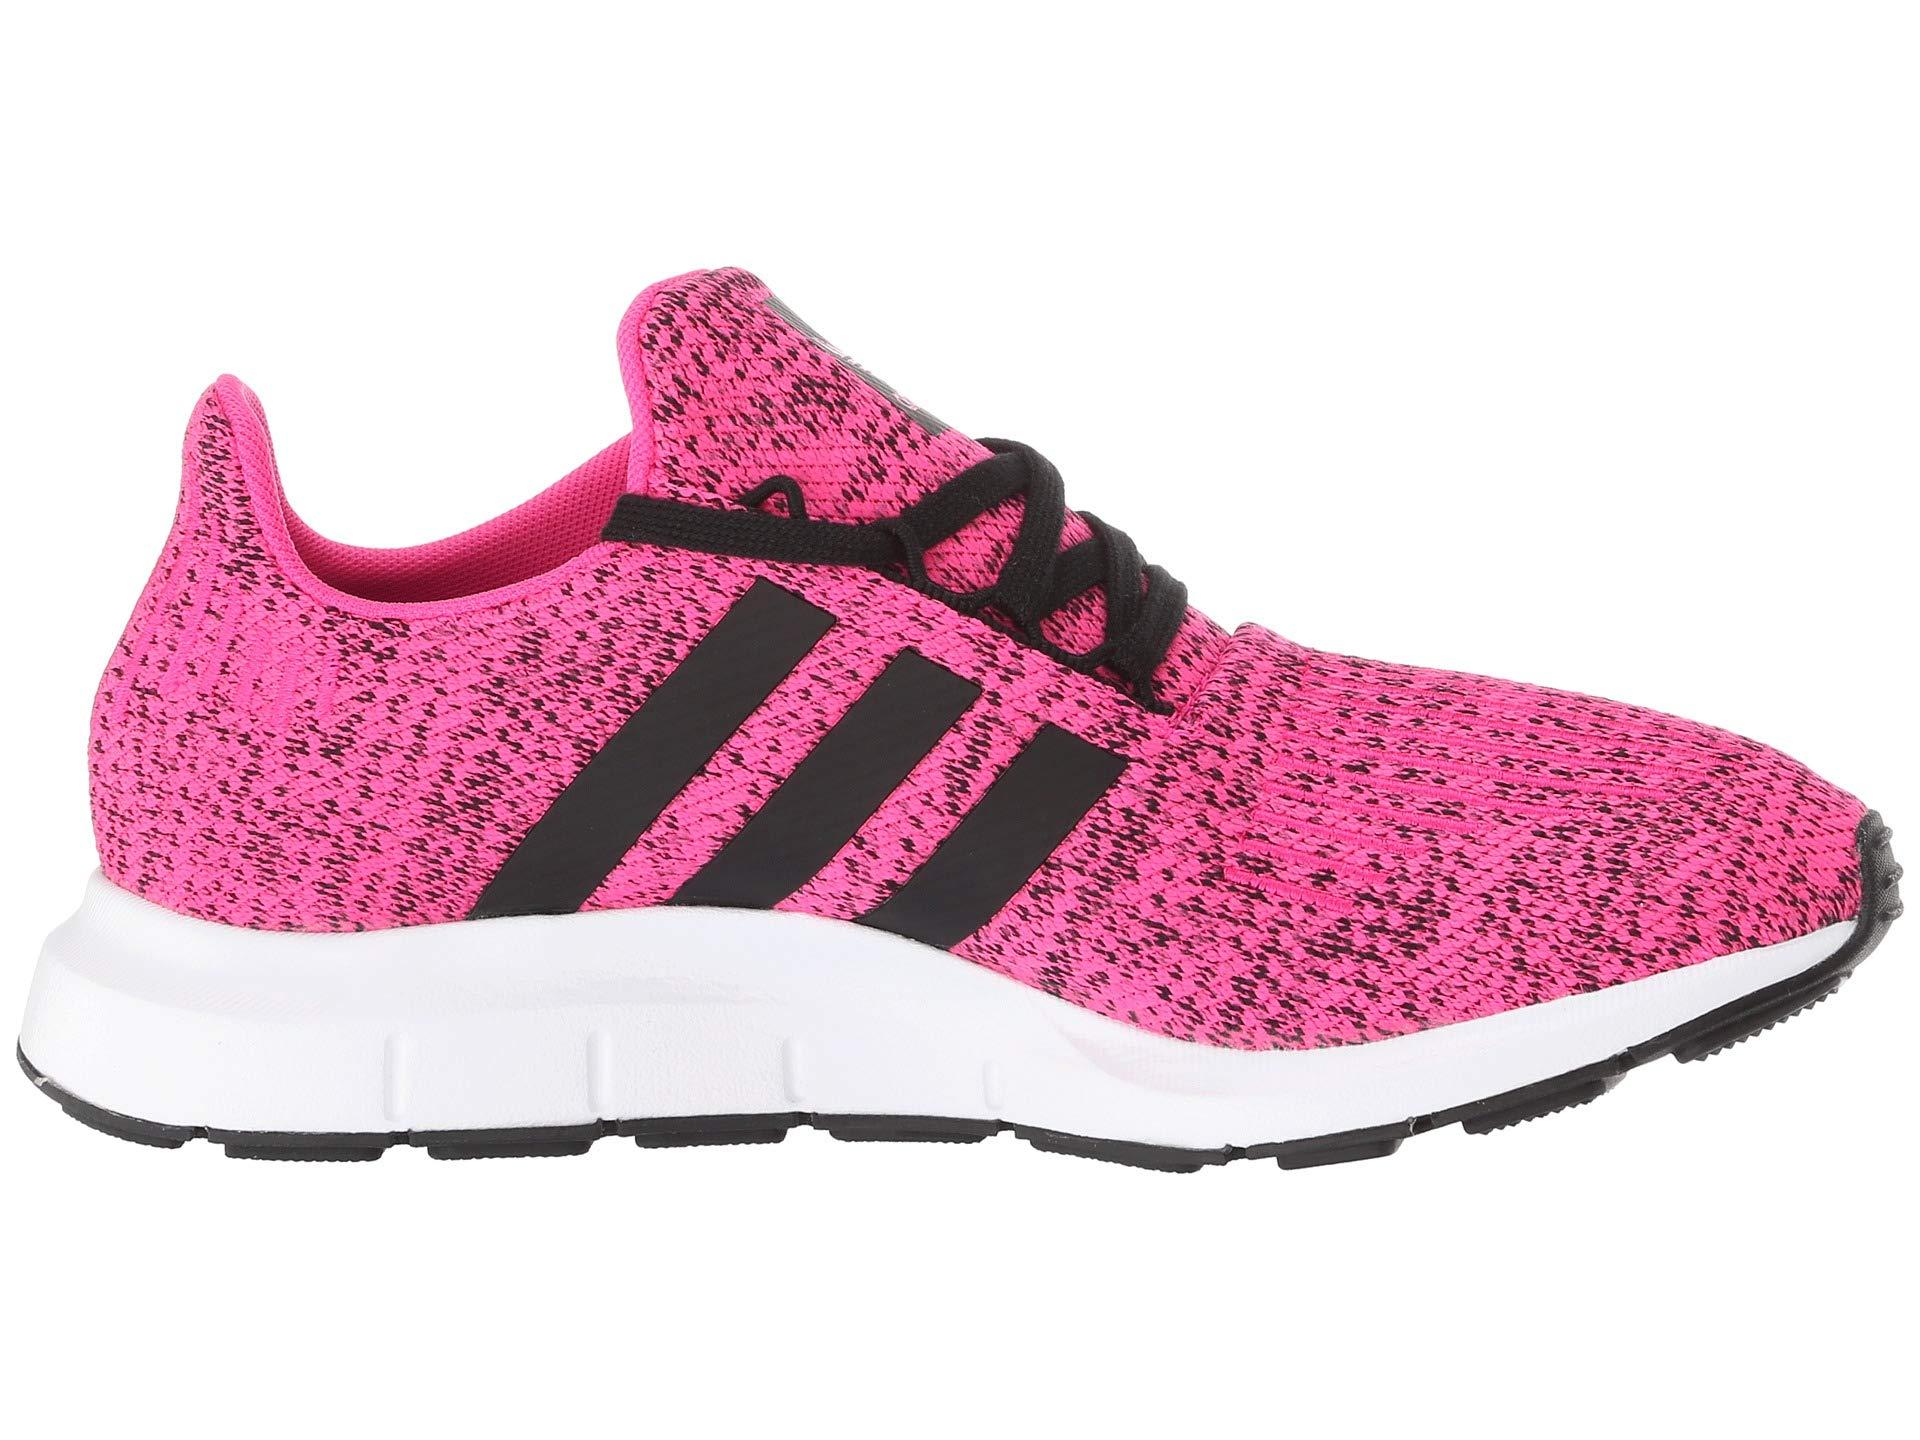 adidas Originals Kids Girl's Swift Run J (Big Kid) Shock Pink/Black 4.5 M US Big Kid by adidas Originals (Image #8)